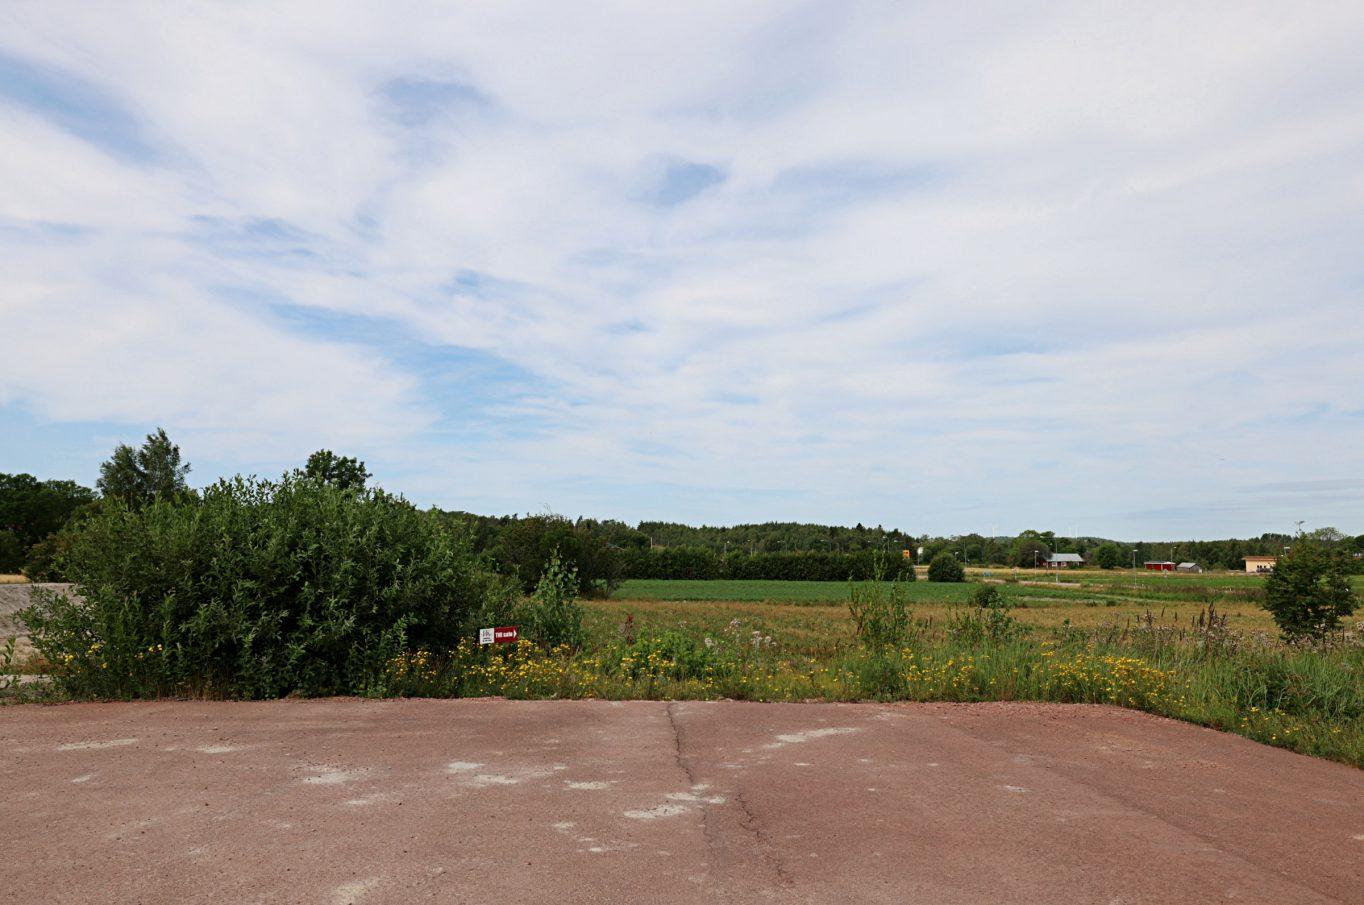 Bostadstomt nr 2 i Söderby, Lemland